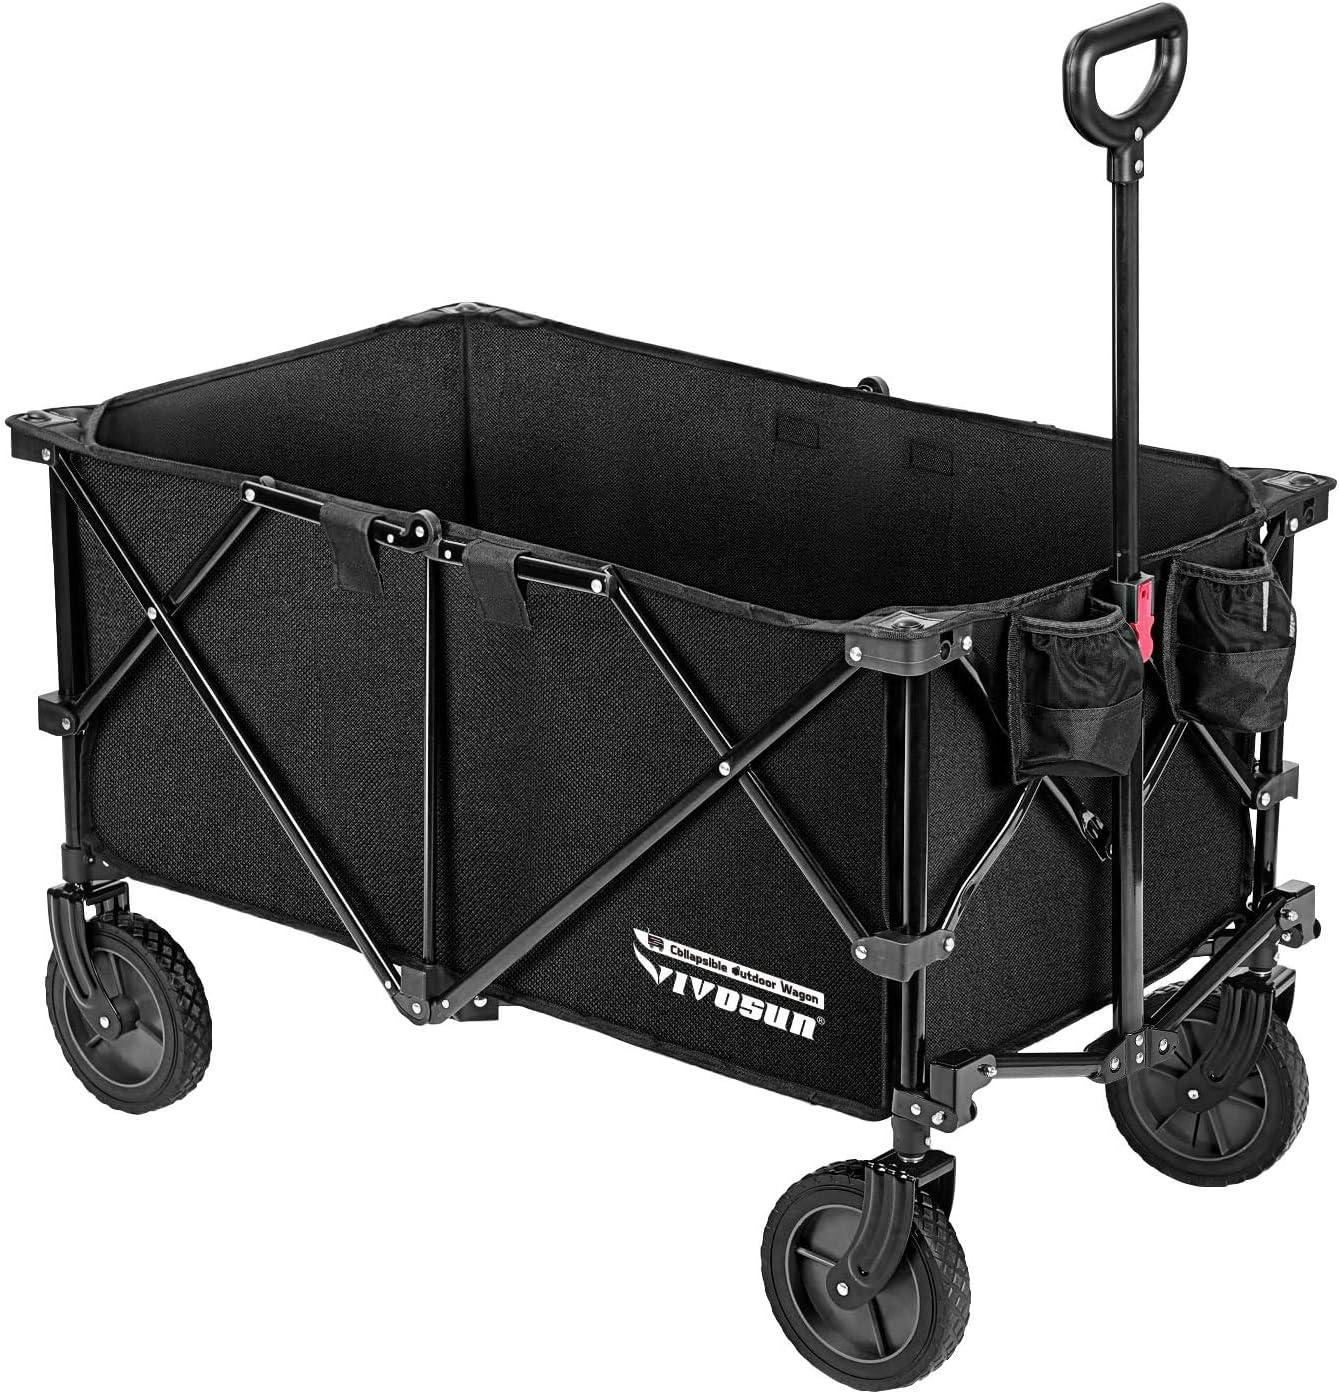 Vivosun Heavy Duty Collapsible Wagon